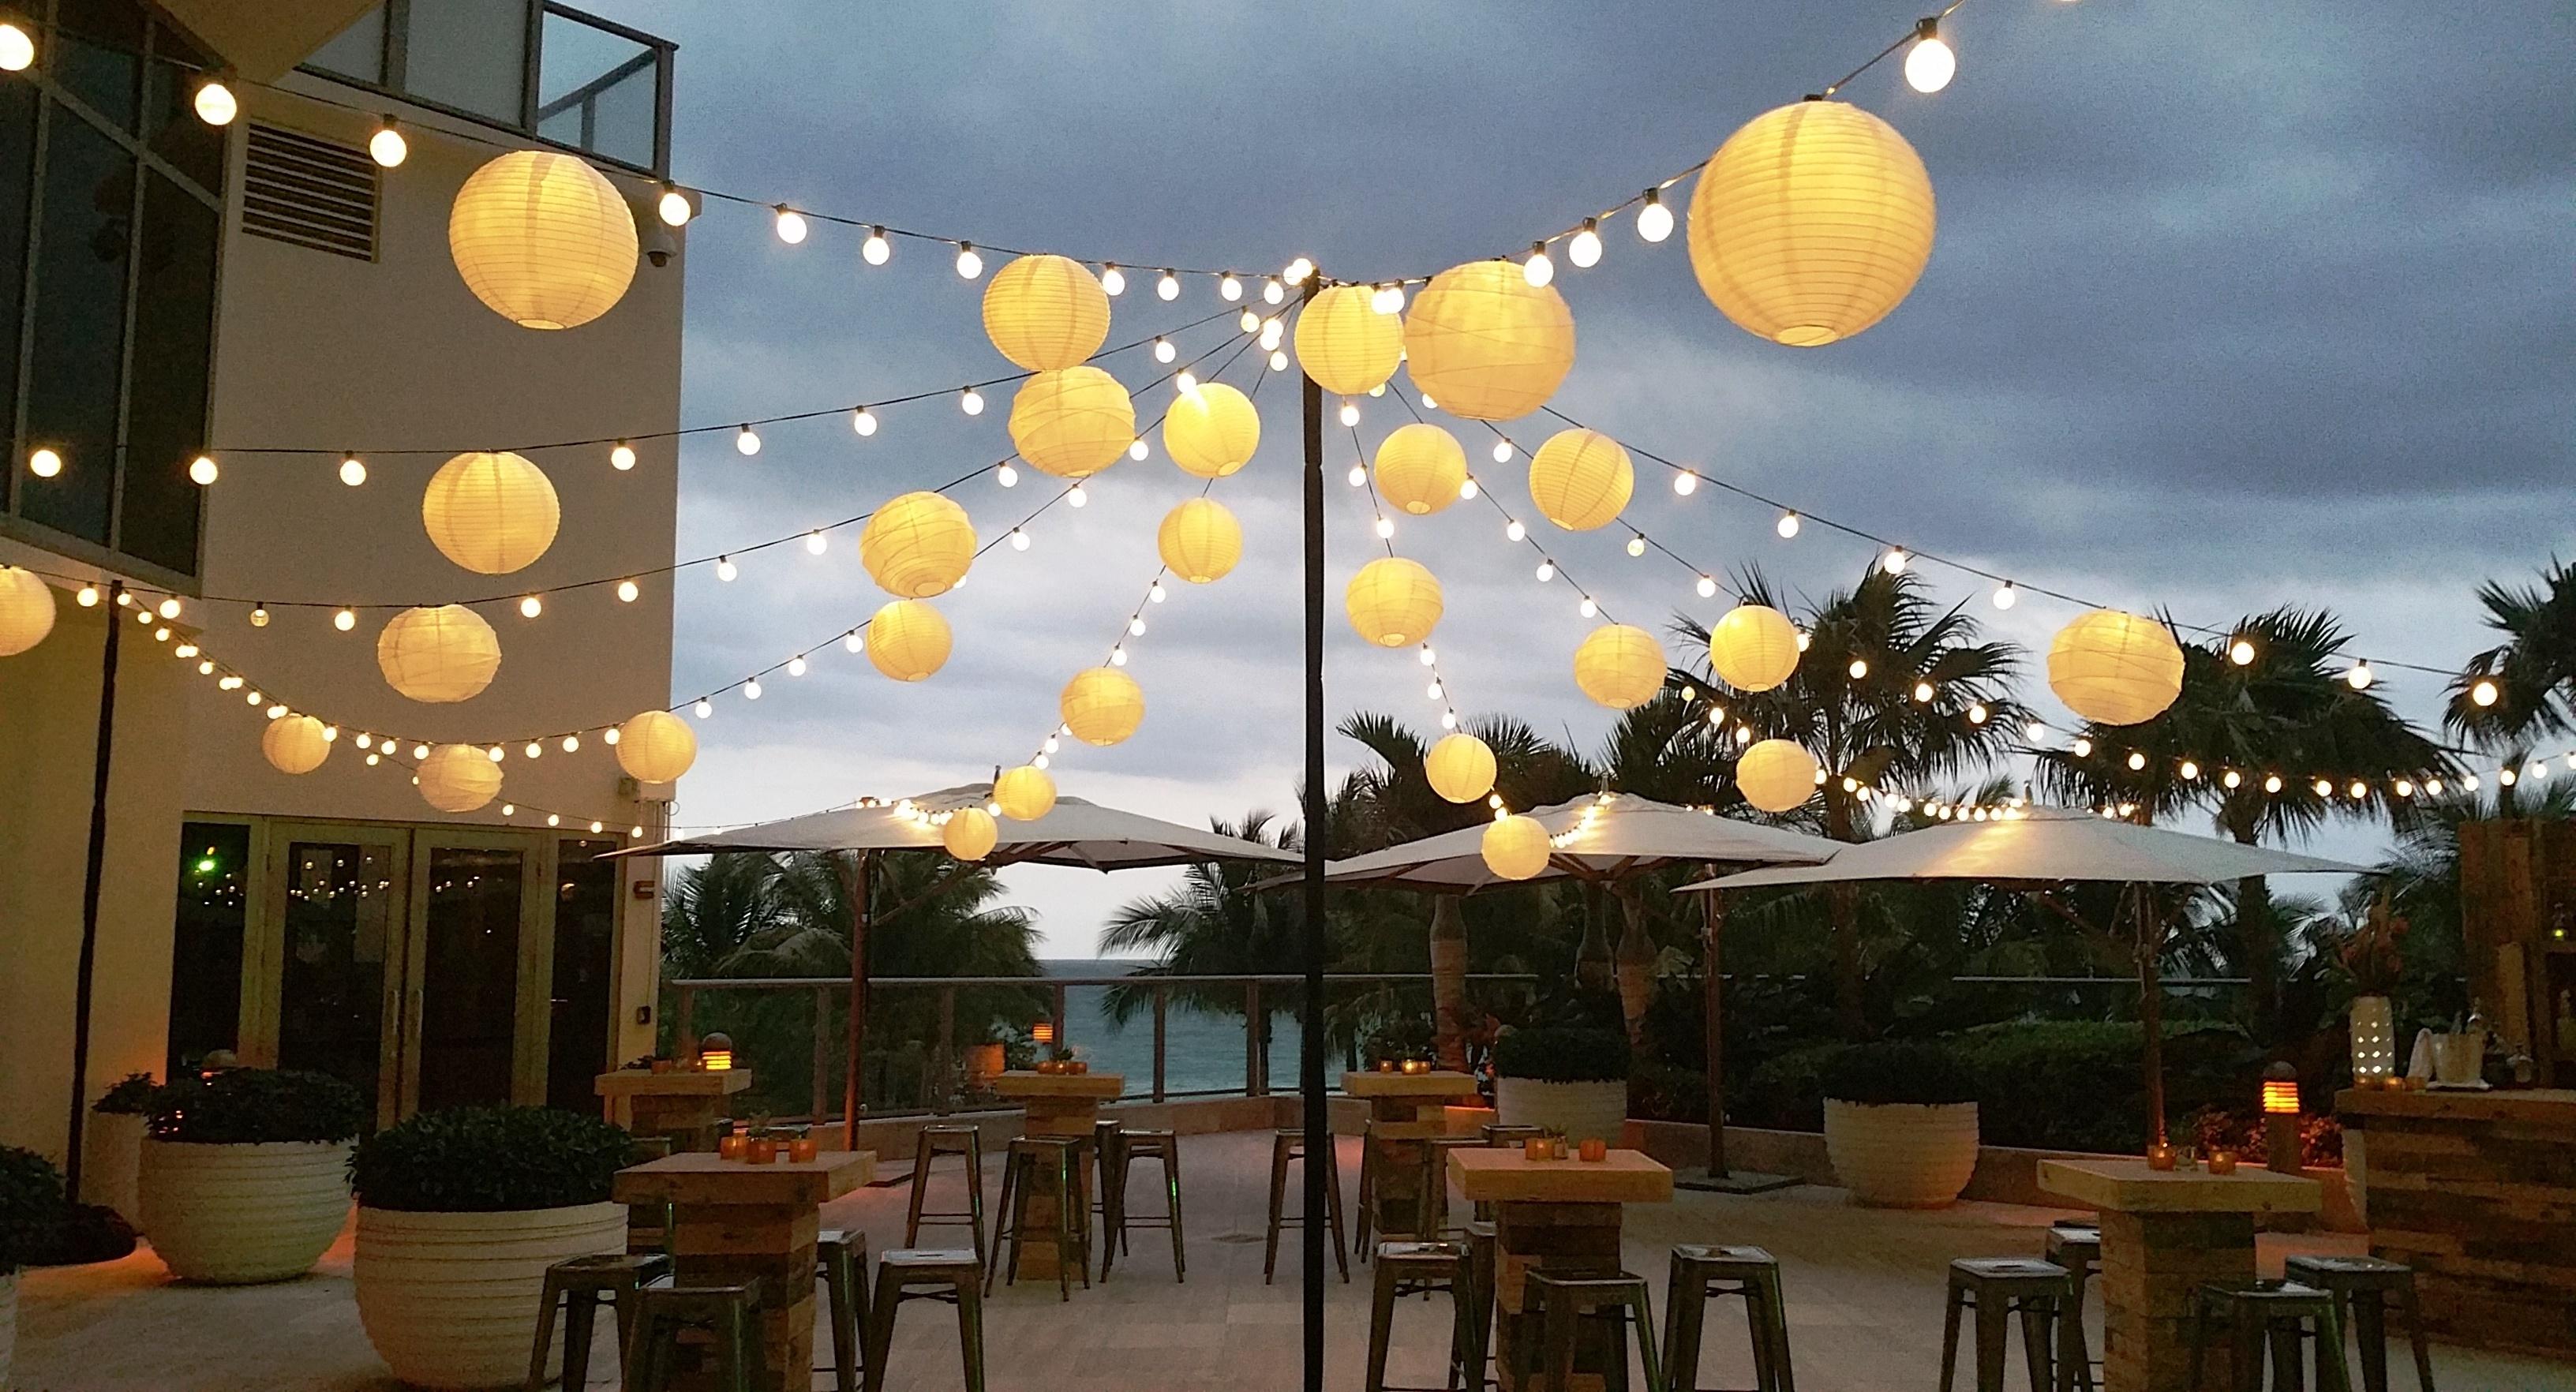 Most Current Furniture : Paper Lantern Lights Outdoor Matt And Jentry Home Design Regarding Outdoor Hanging Paper Lantern Lights (View 10 of 20)